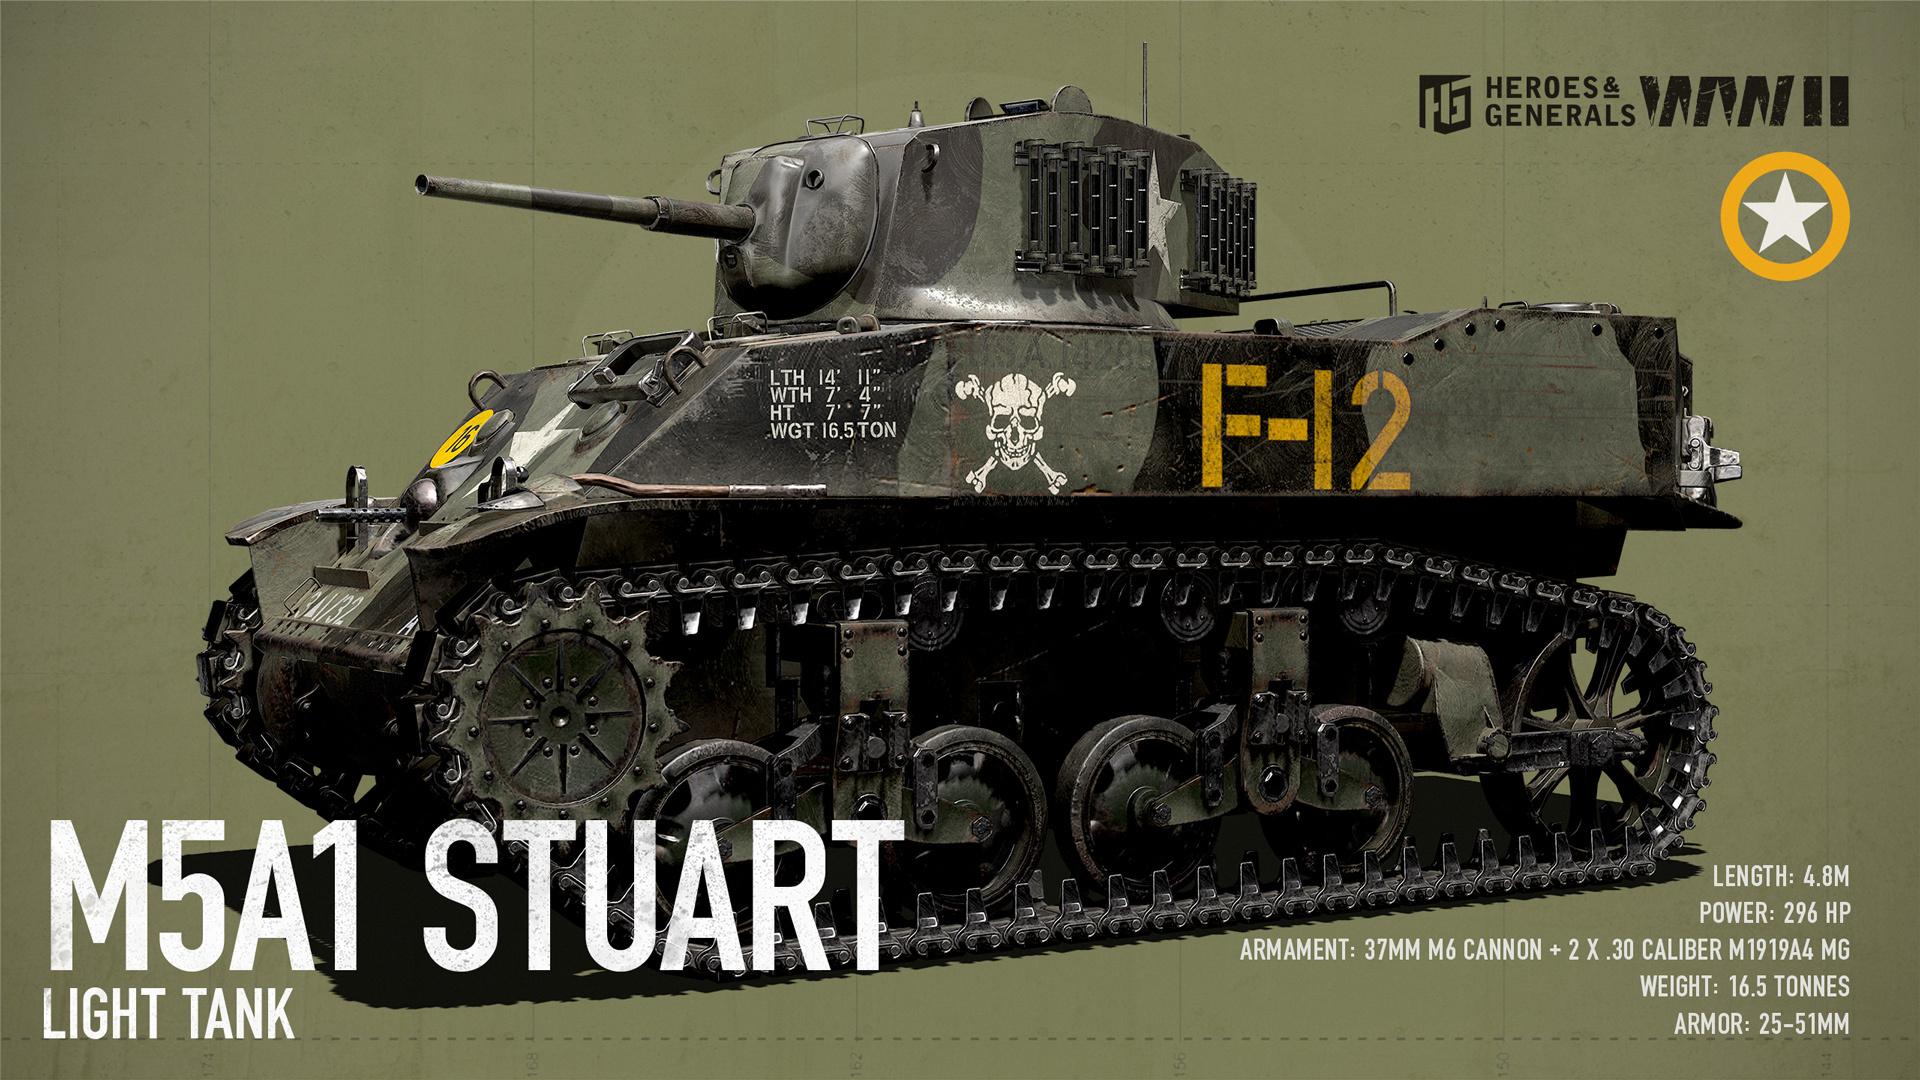 m5a1 Stuart matchmaking